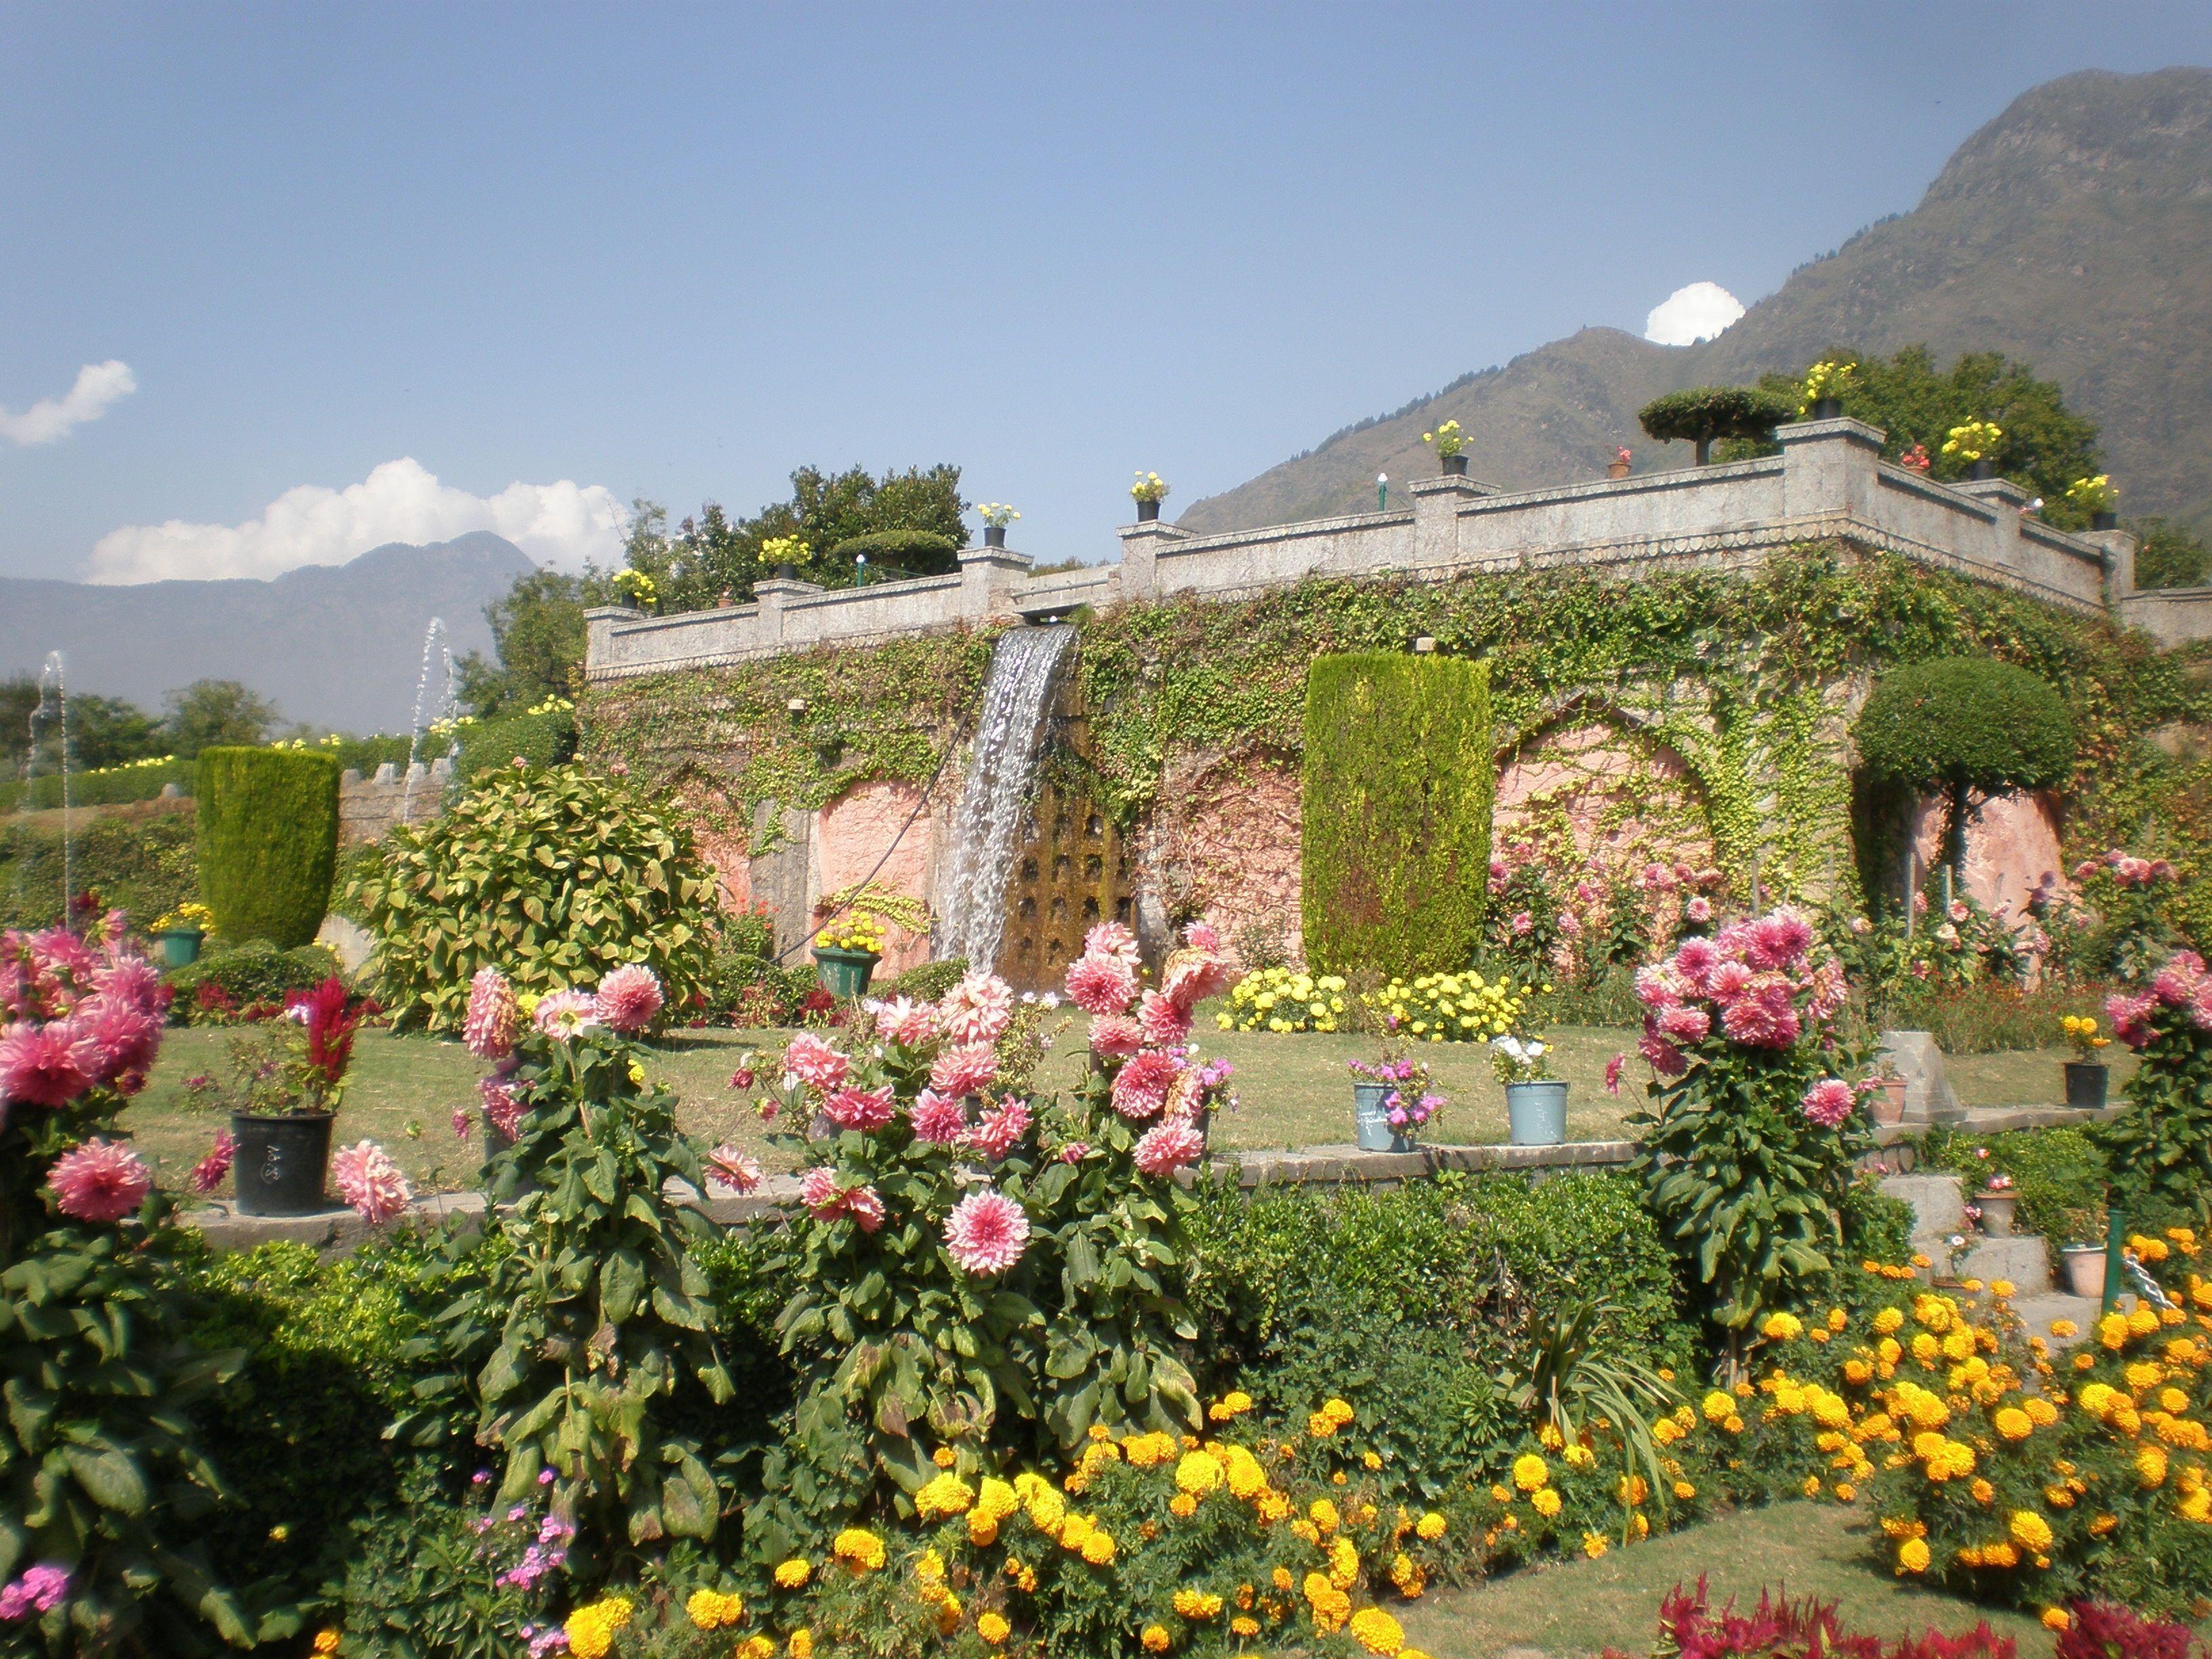 Mughal Gardens Srinigar The Kashmir Shawl Kashmir India ...